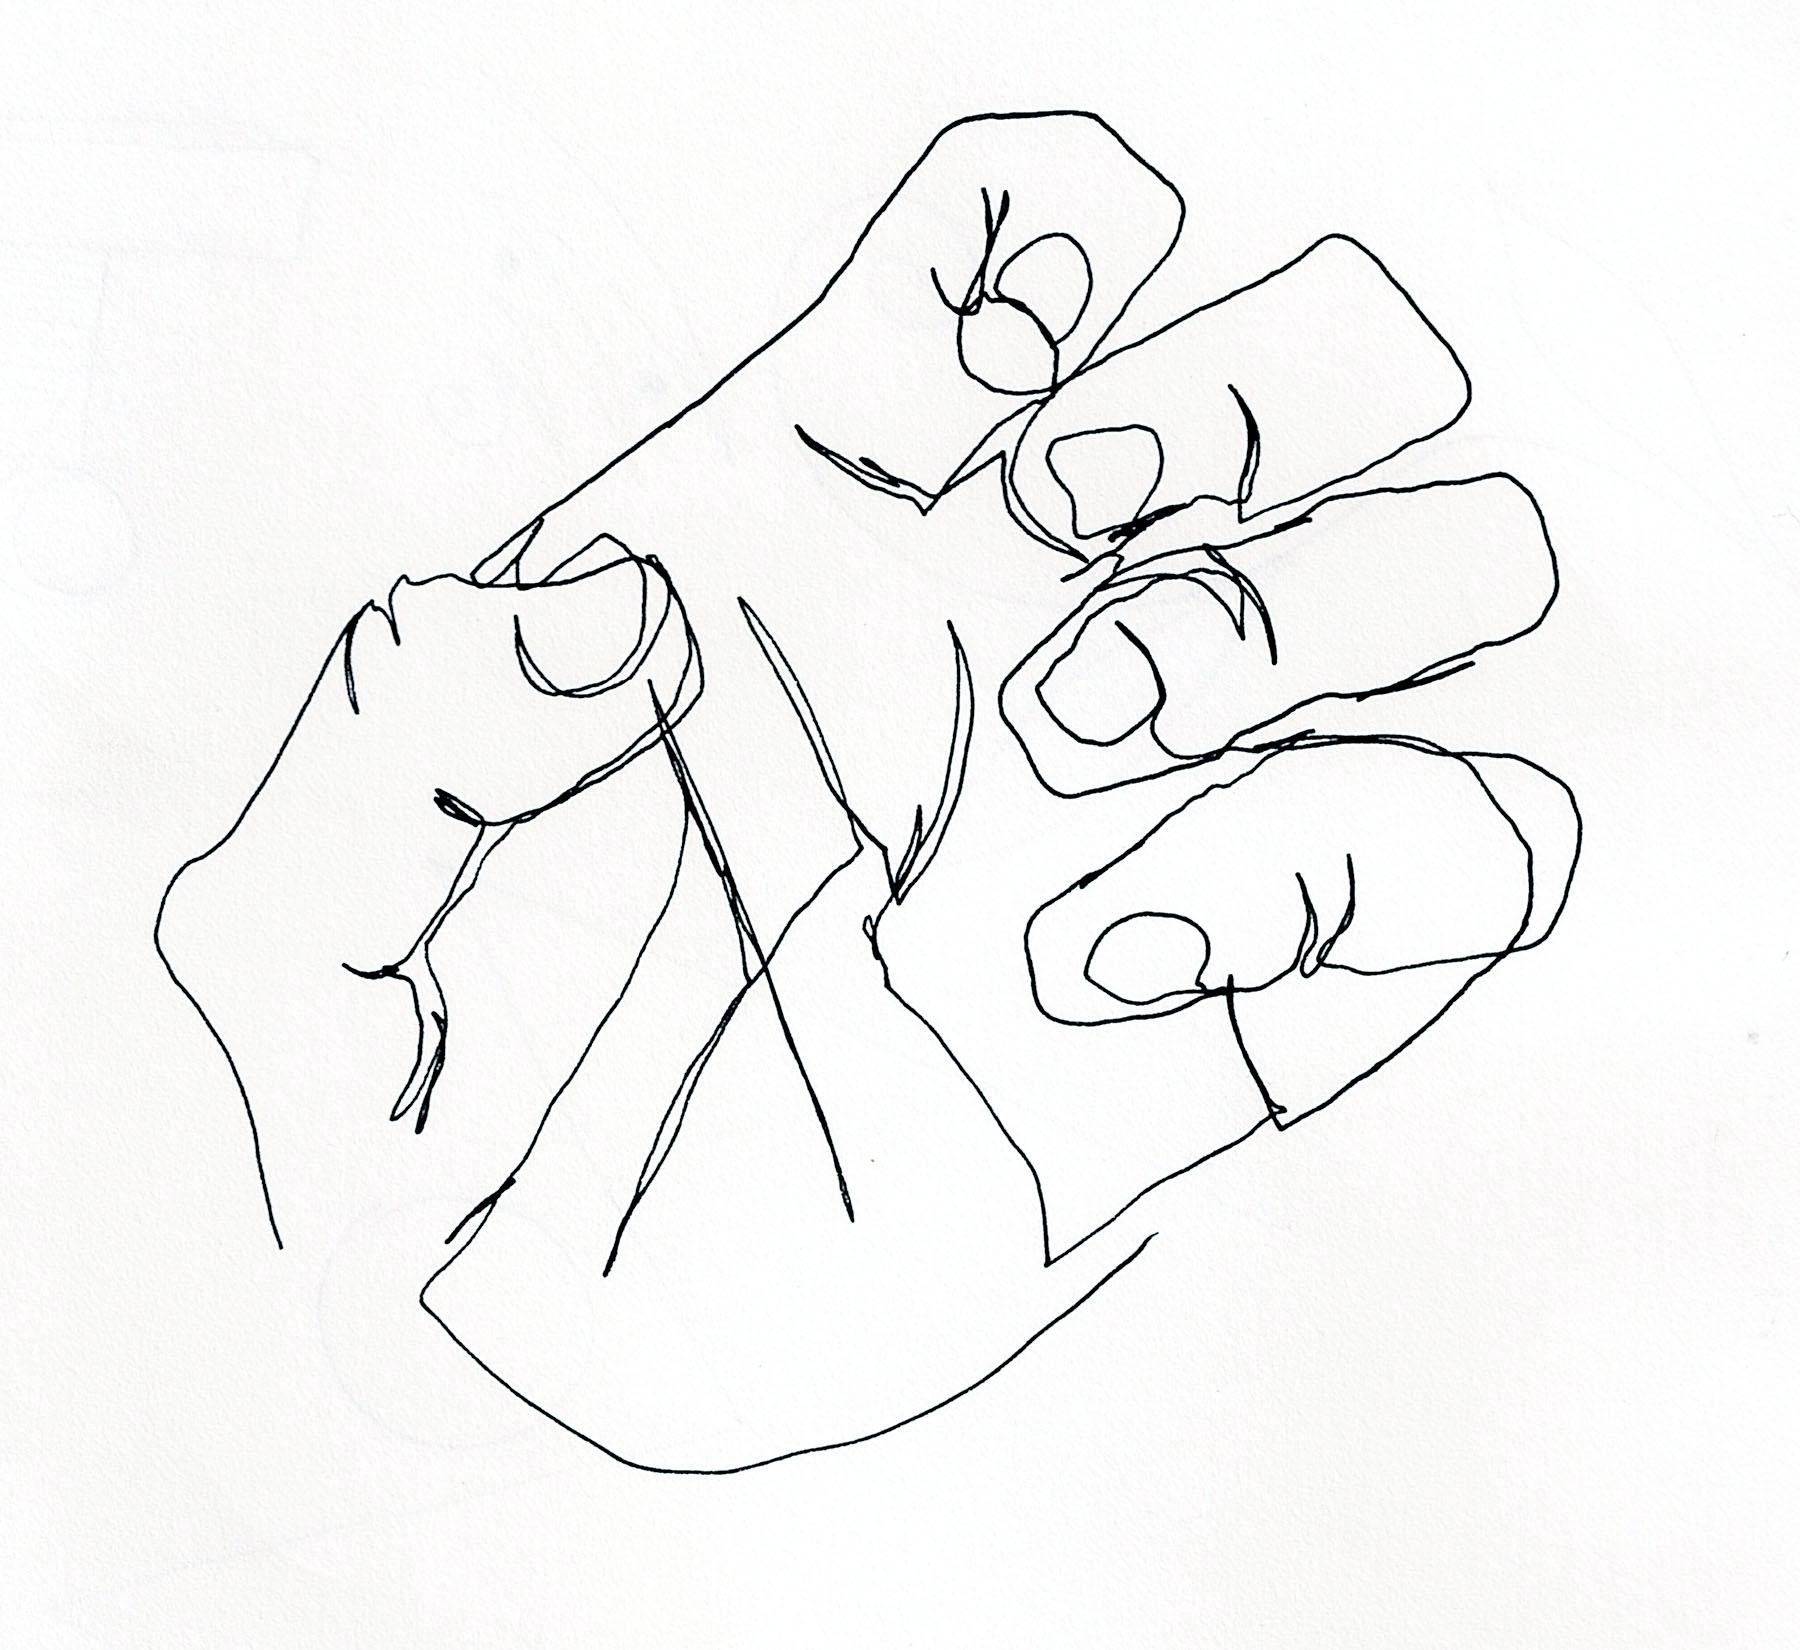 1800x1650 Contour Line Drawing Hand Brian Cho